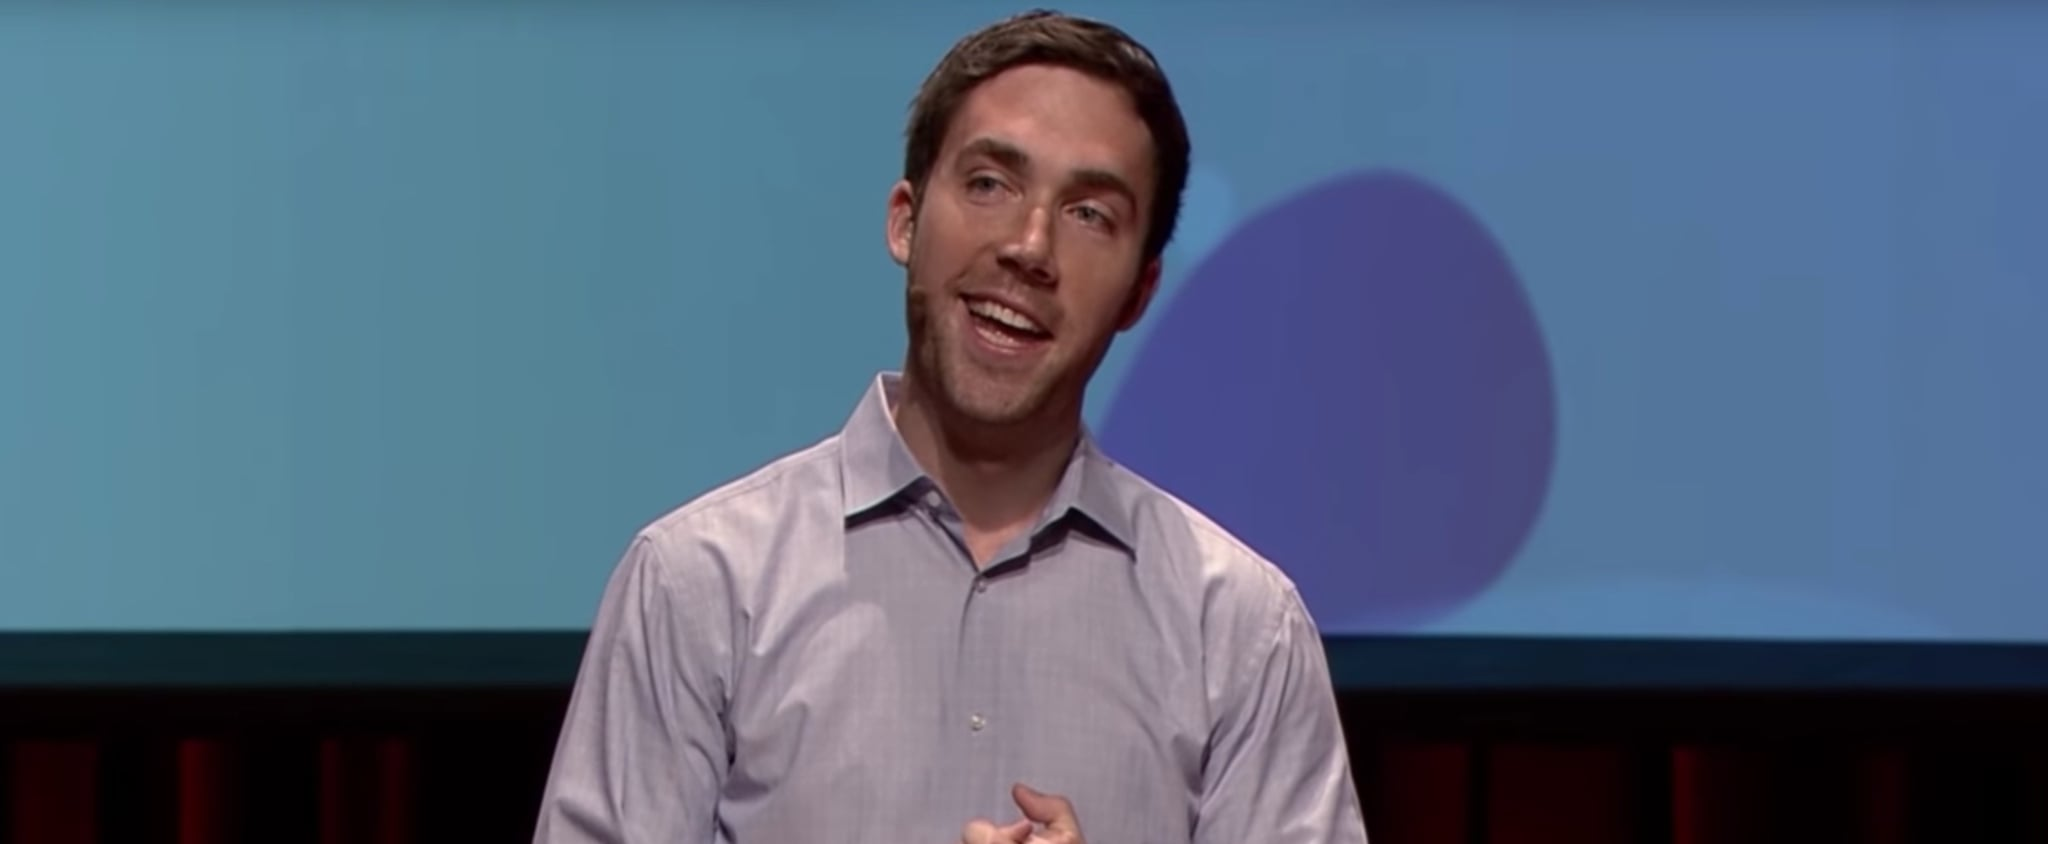 TEDx Talk on Colourblindness   Video